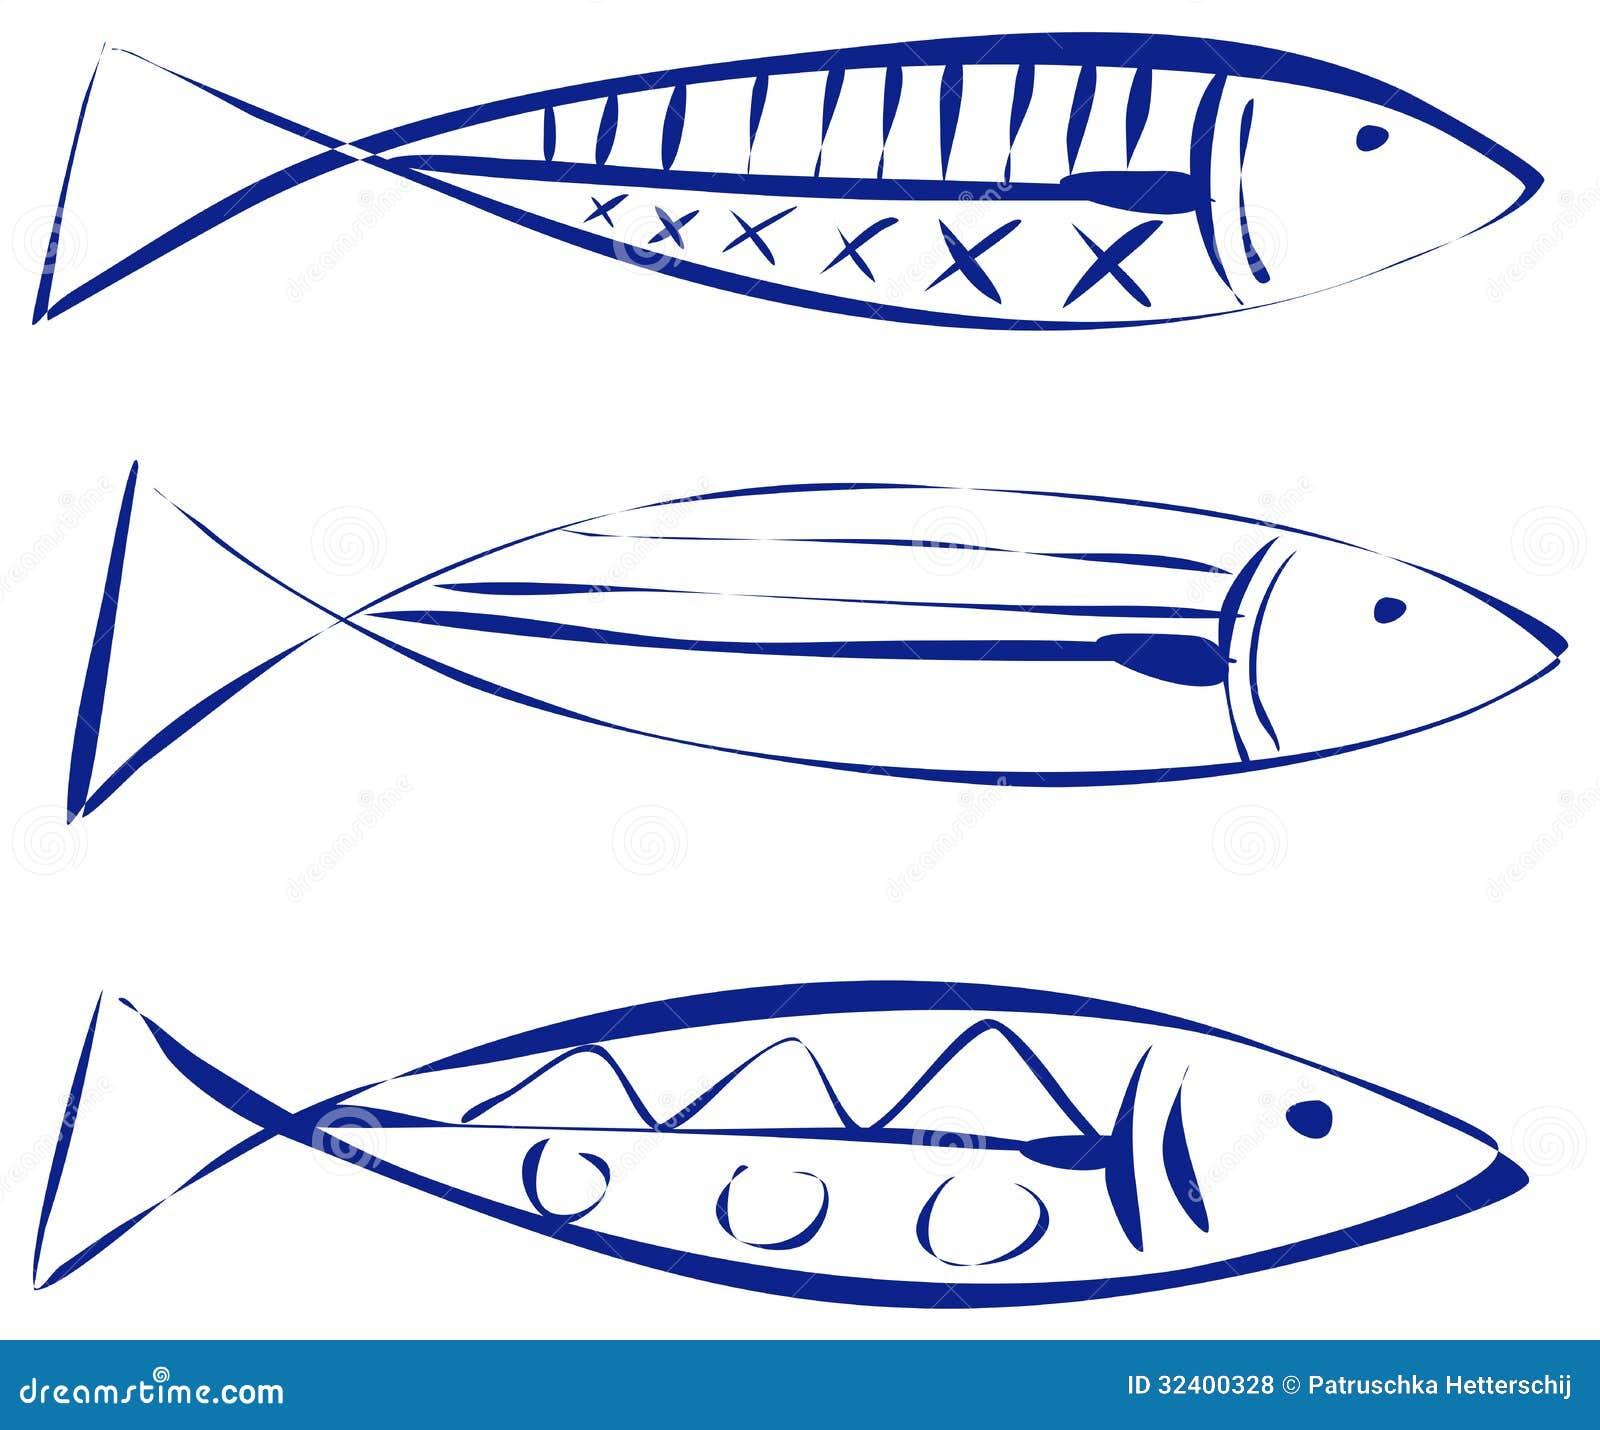 Best Kitchen Illustrations Royalty Free Vector Graphics: Sardines Stock Vector. Illustration Of Nutrition, Italian